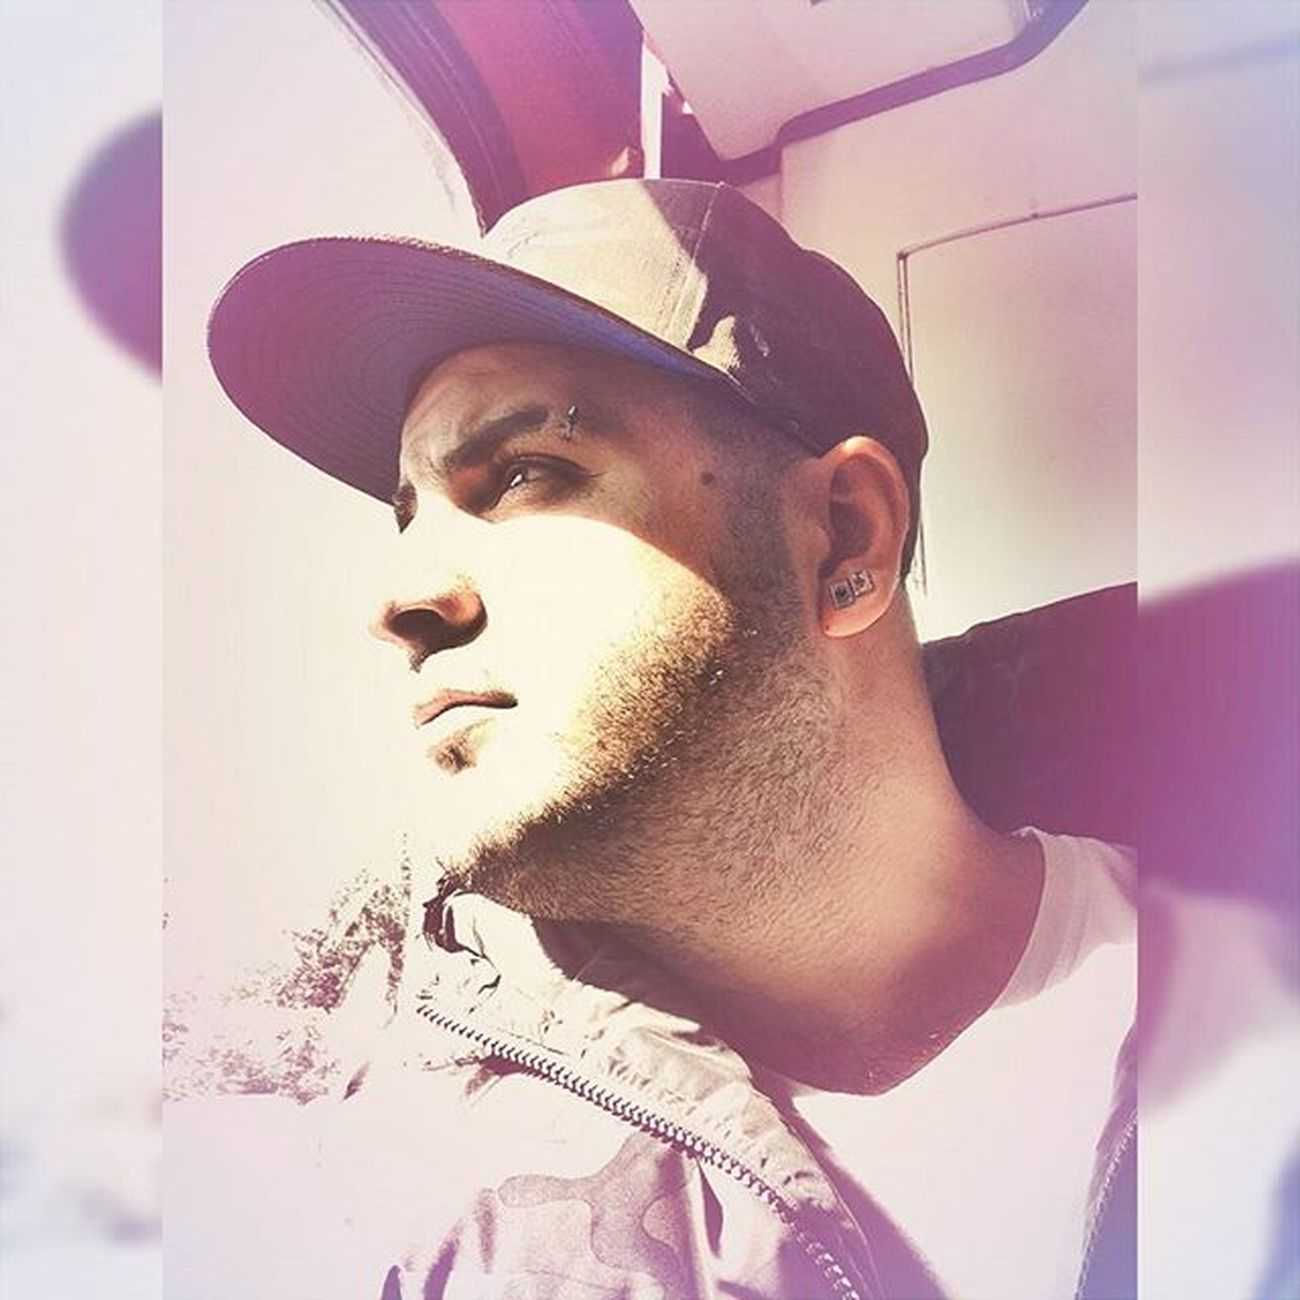 Güzel günler göreceğiz çocuklar ☺ Cap Fullcap Piercing Earrings Küpe Küpeler Me Ben Smile Smiles Smiley Hello Retro Retrocam Mycam MYSELFIE Instamood Instamorning Instagood Instadaily Instaforever